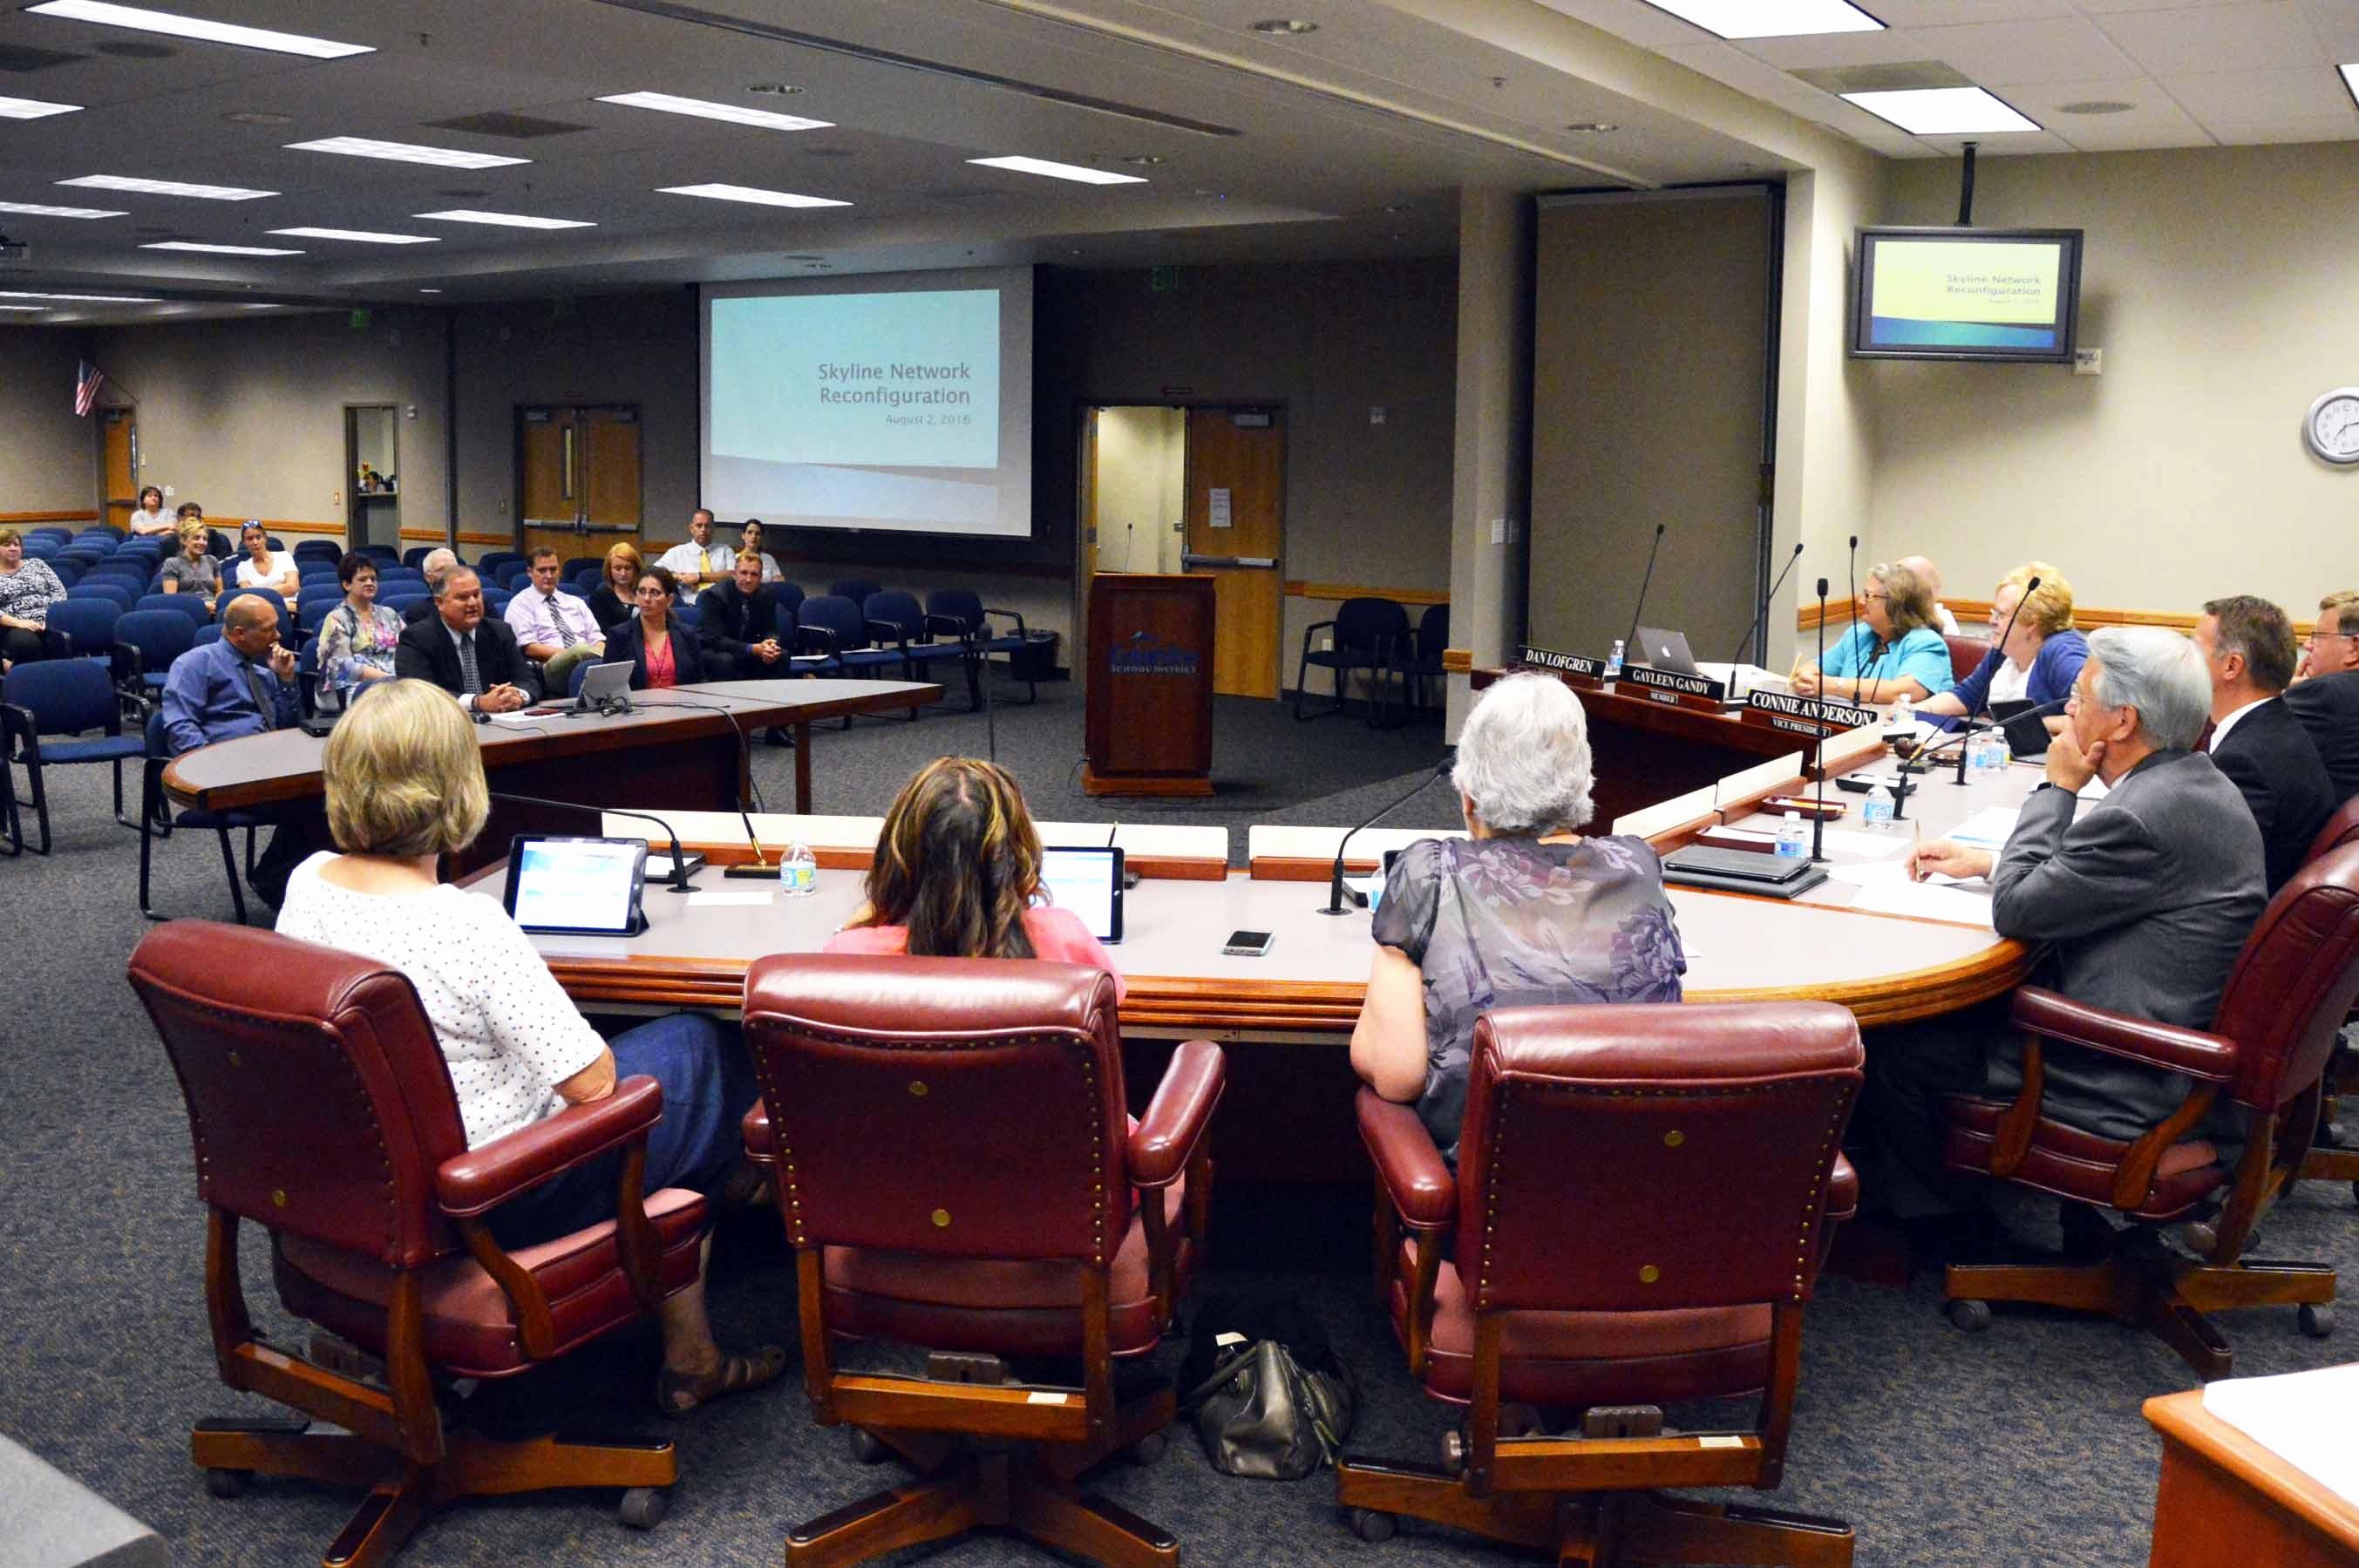 At Meeting or In Meeting Beautiful Board Meeting Report – August 2016